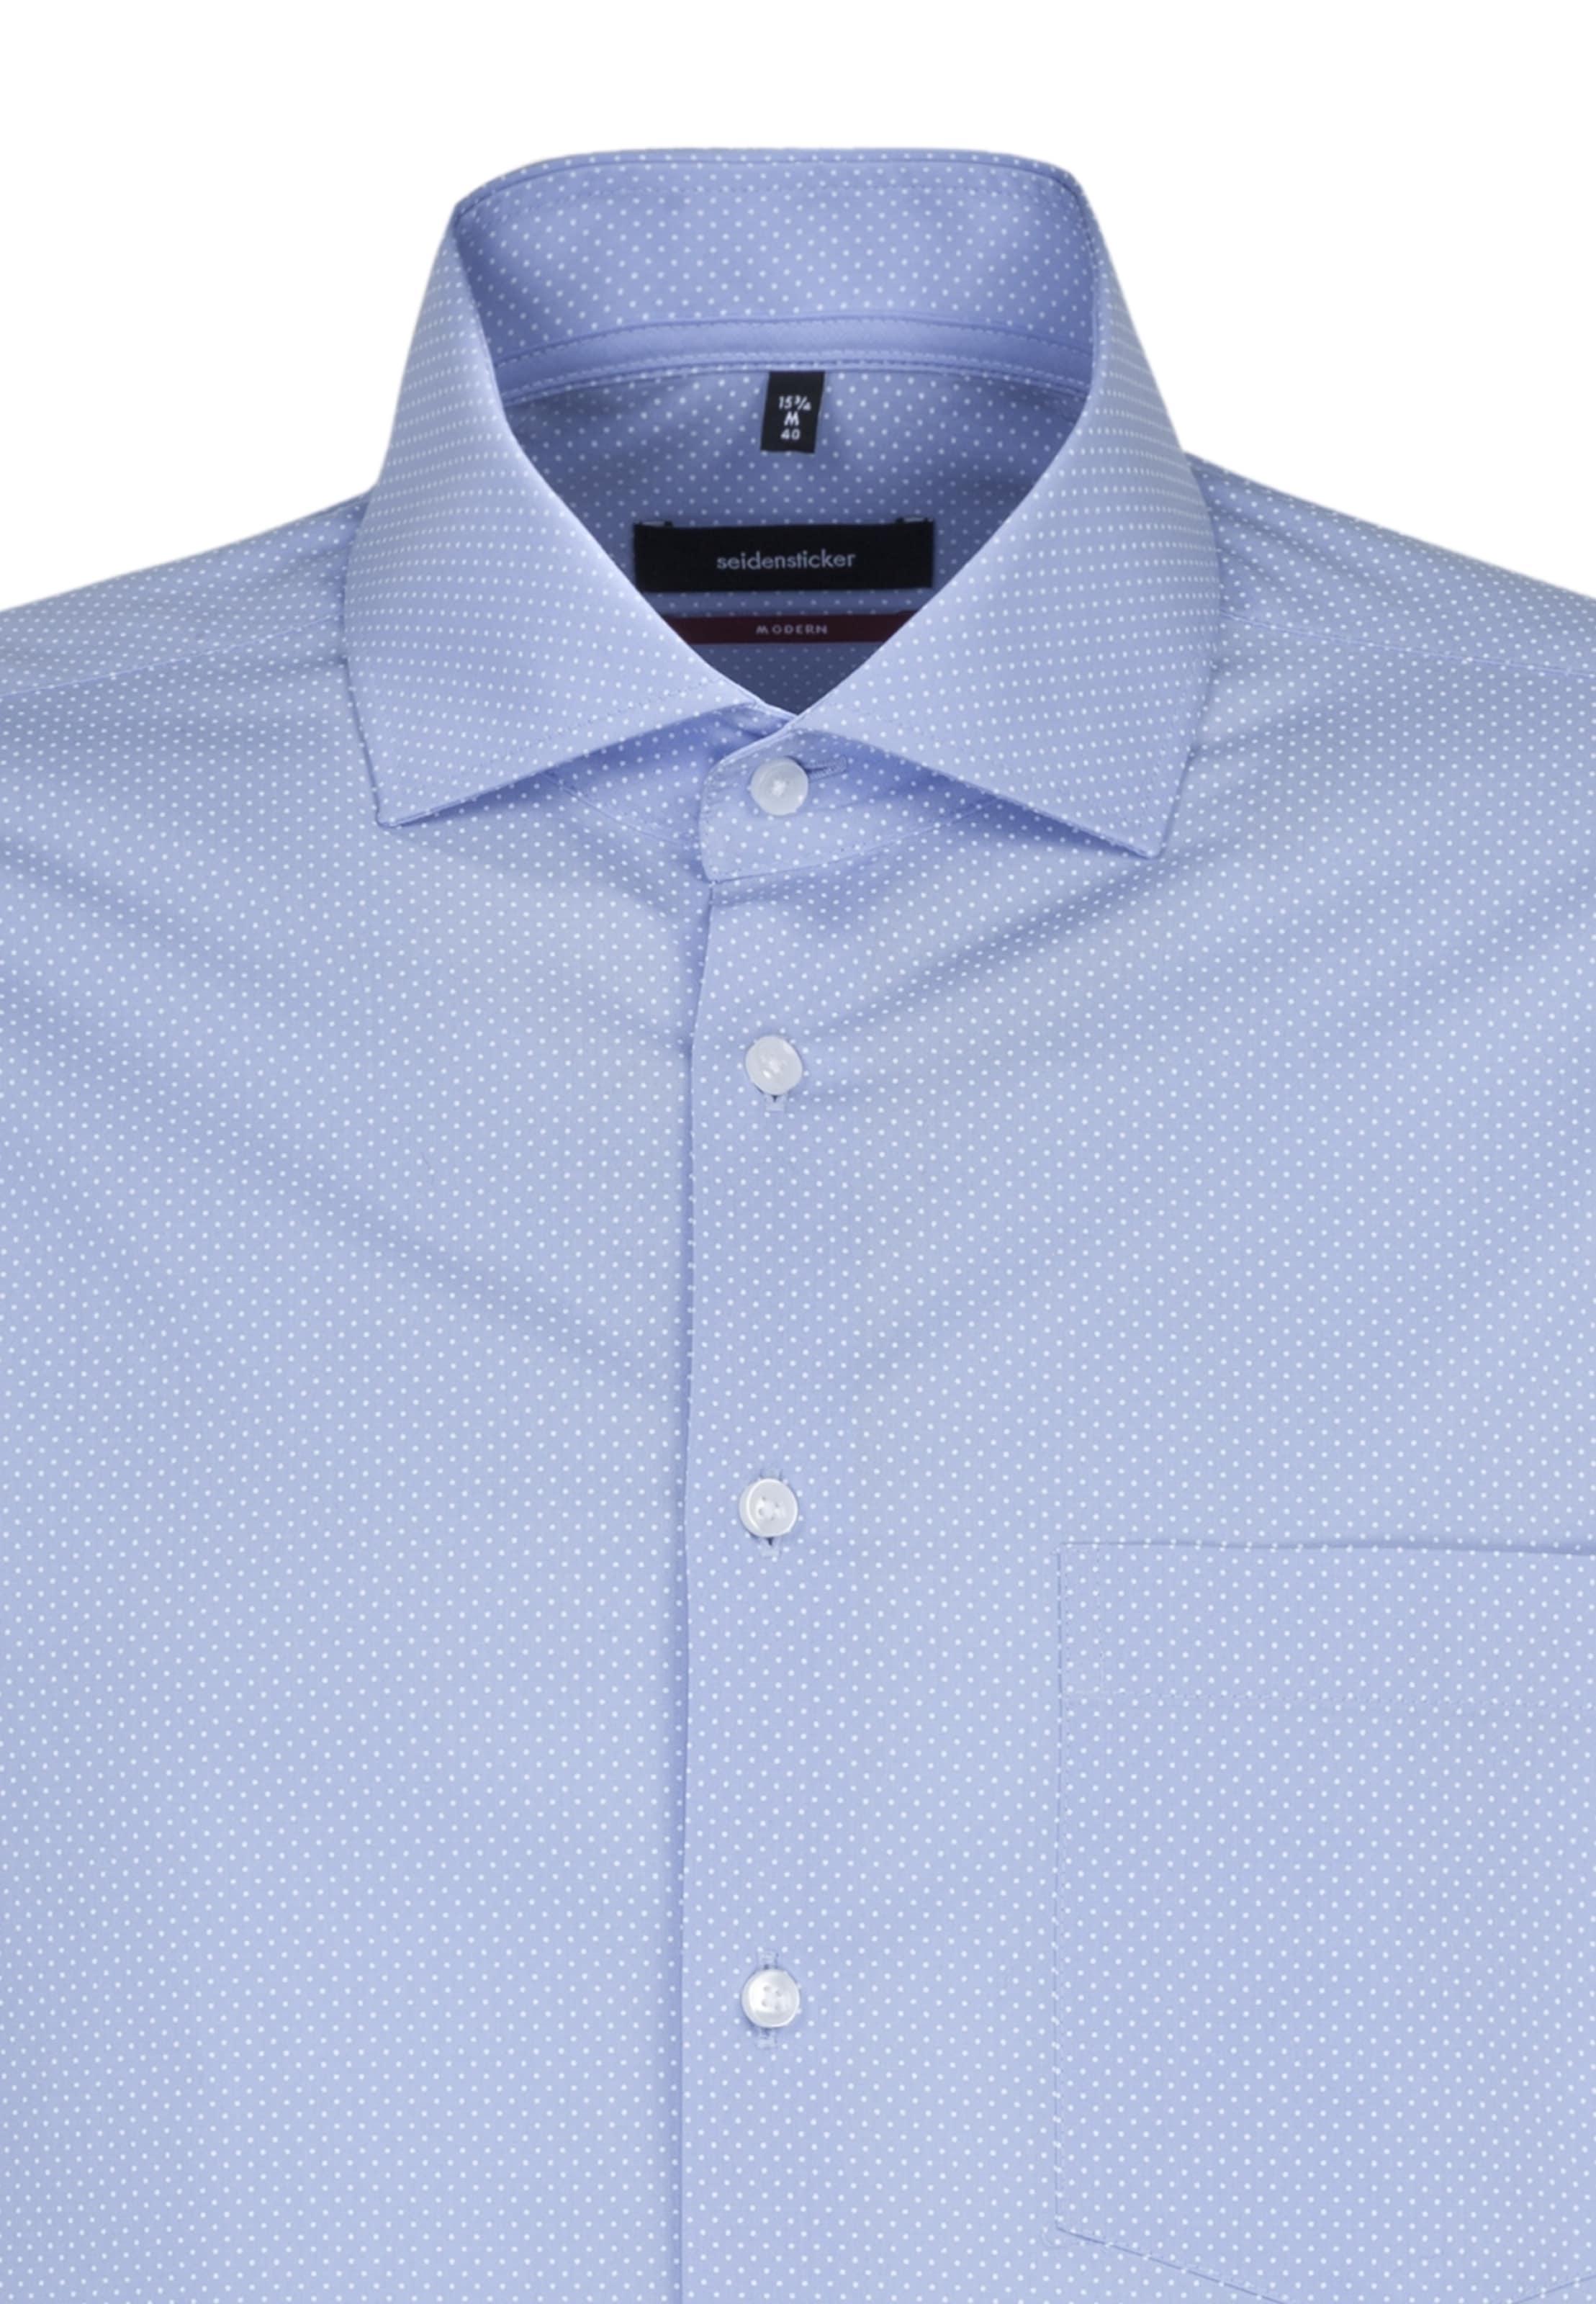 Seidensticker Hemd In Hemd Hemd Seidensticker Seidensticker In RauchblauWeiß RauchblauWeiß In 45LAjc3Rq